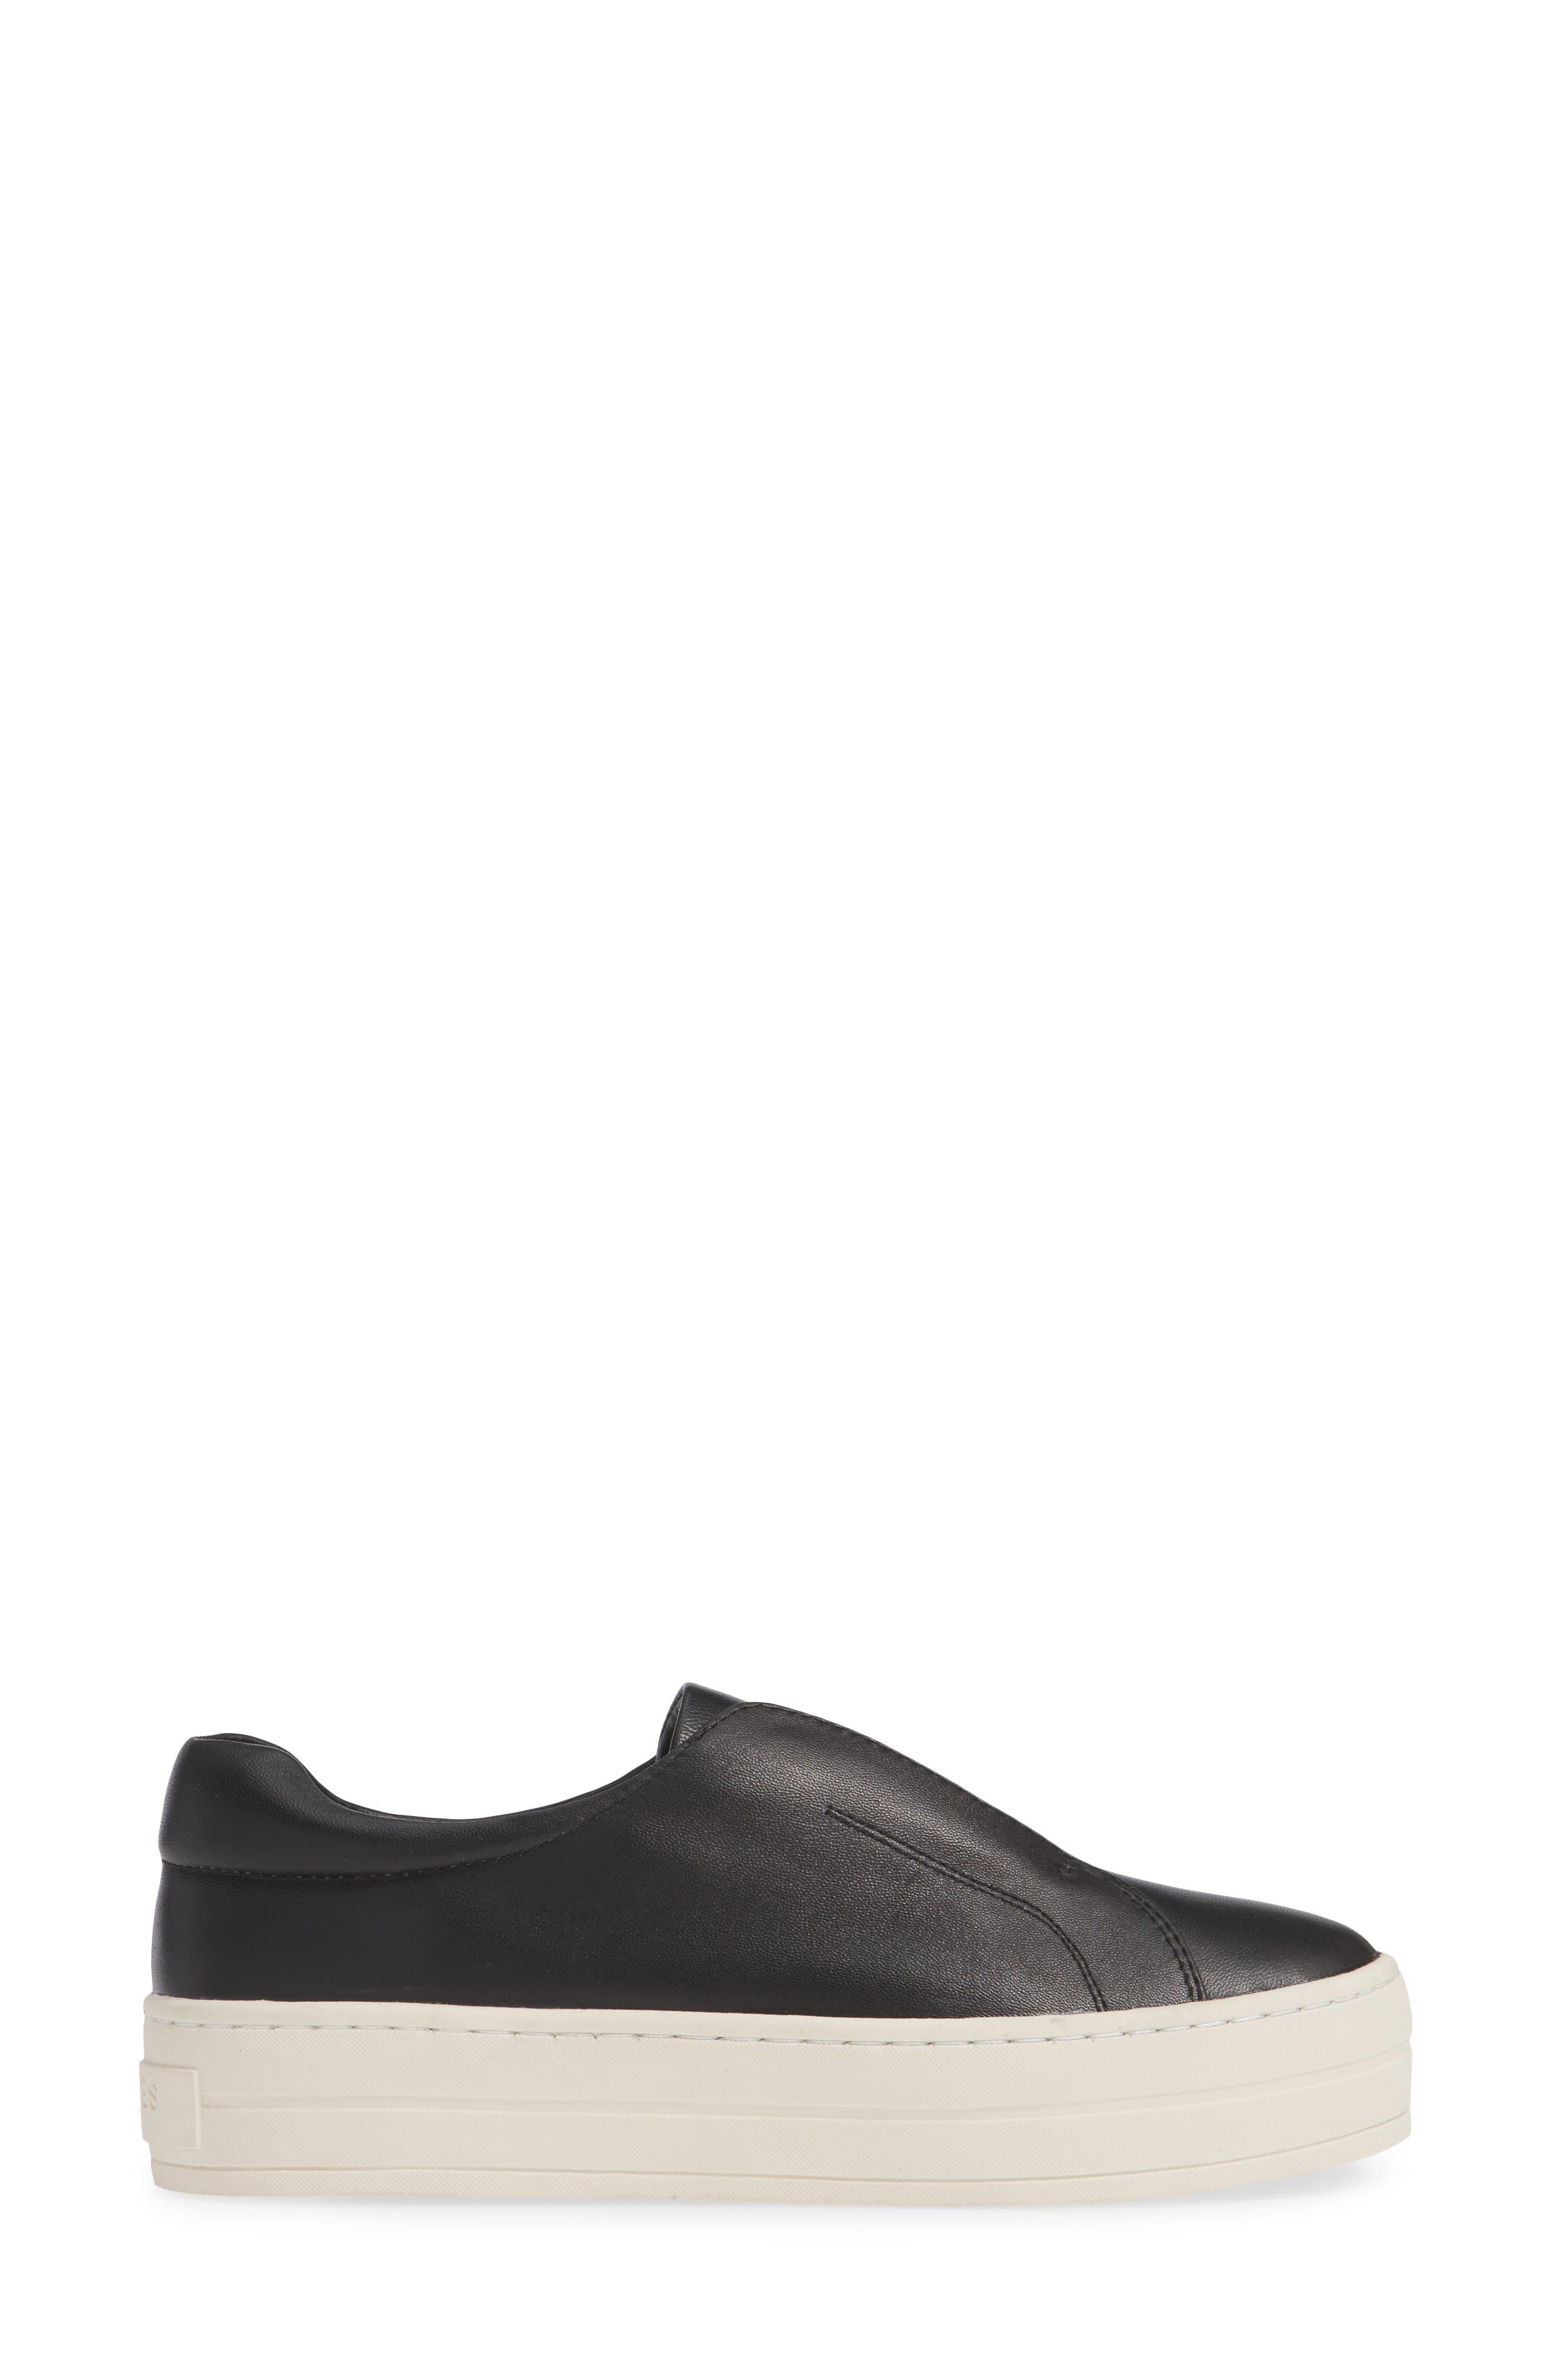 JSLIDES,                             Heidi Platform Slip-On Sneaker,                             Alternate thumbnail 3, color,                             BLACK LEATHER